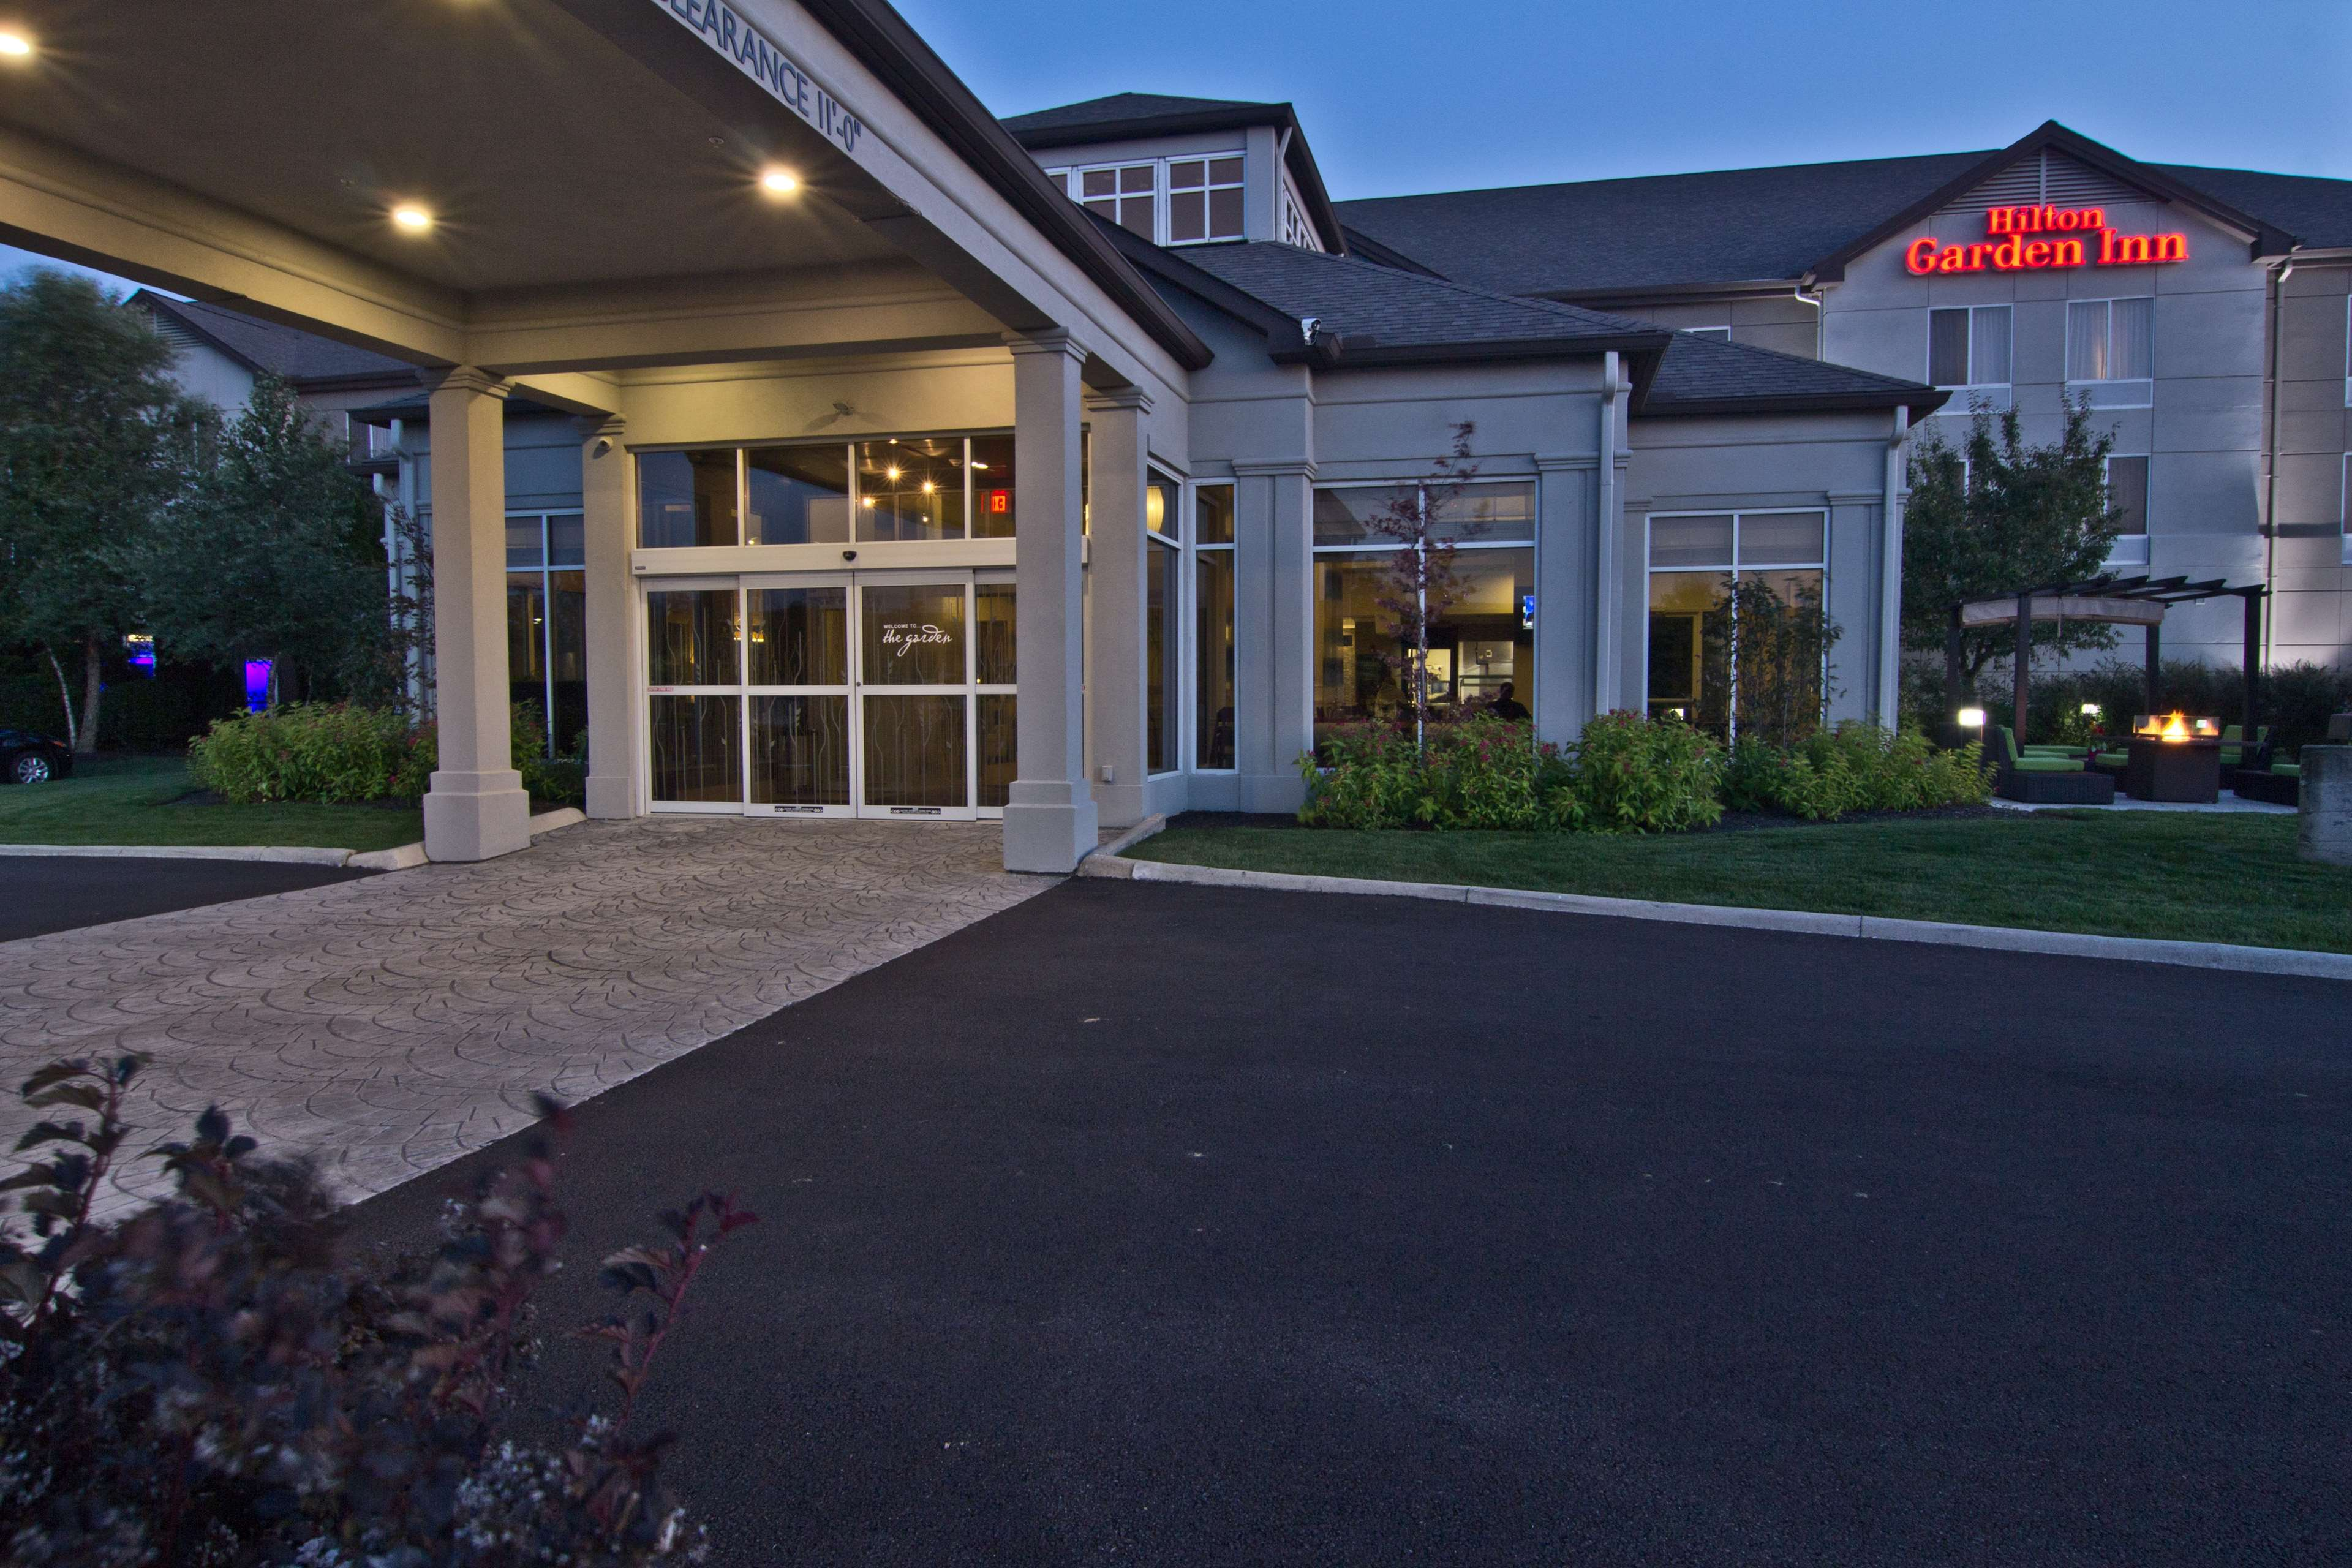 Hilton Garden Inn Columbus/Grove City